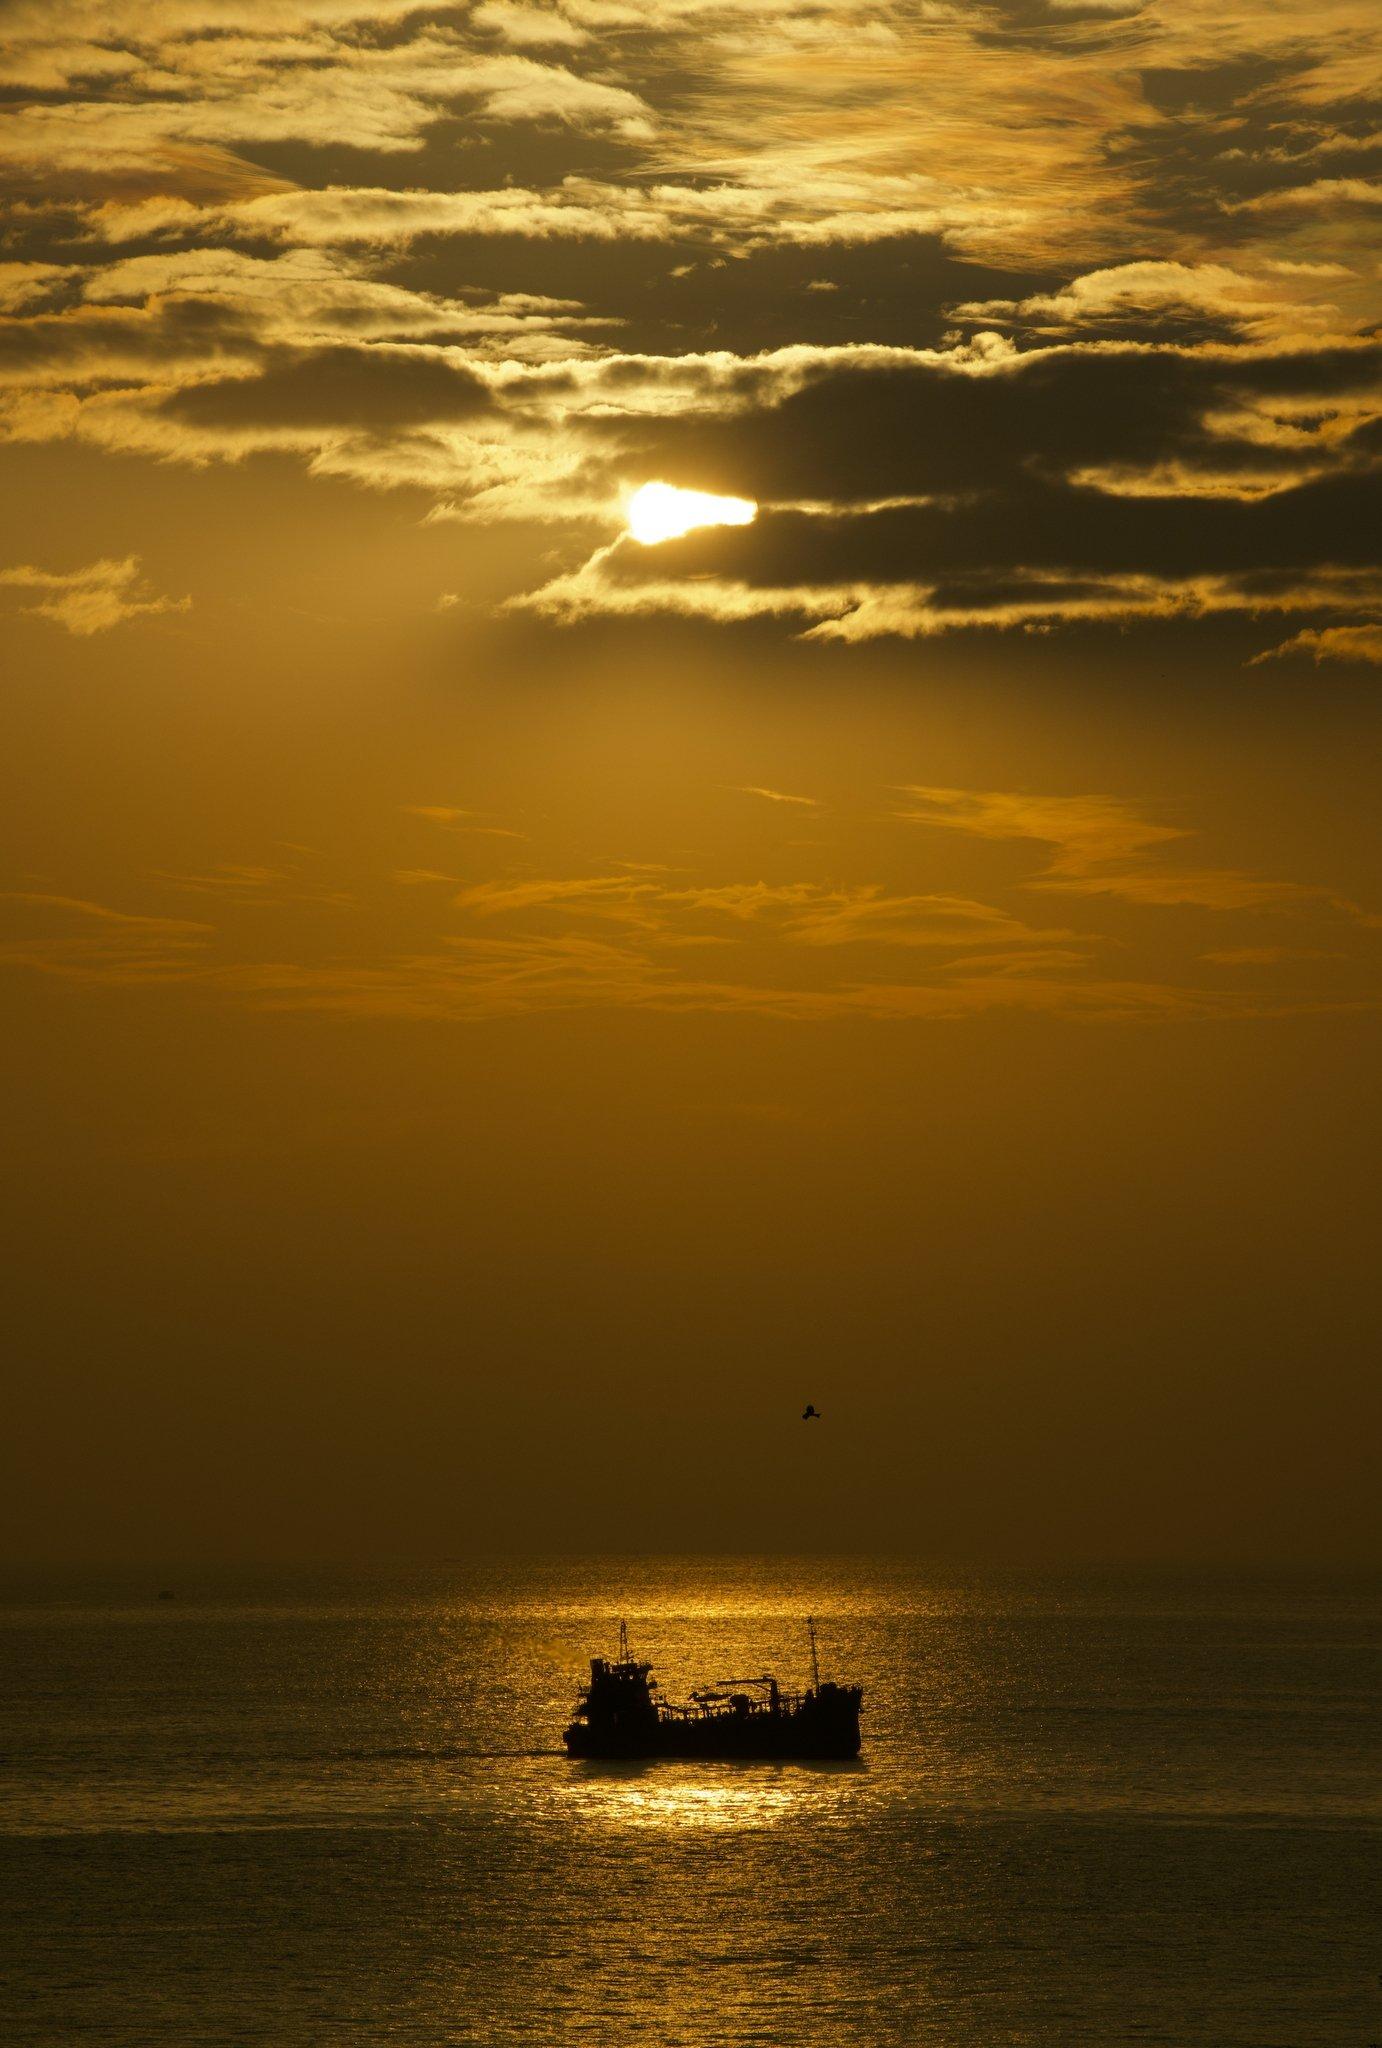 8. Sunset at Sea